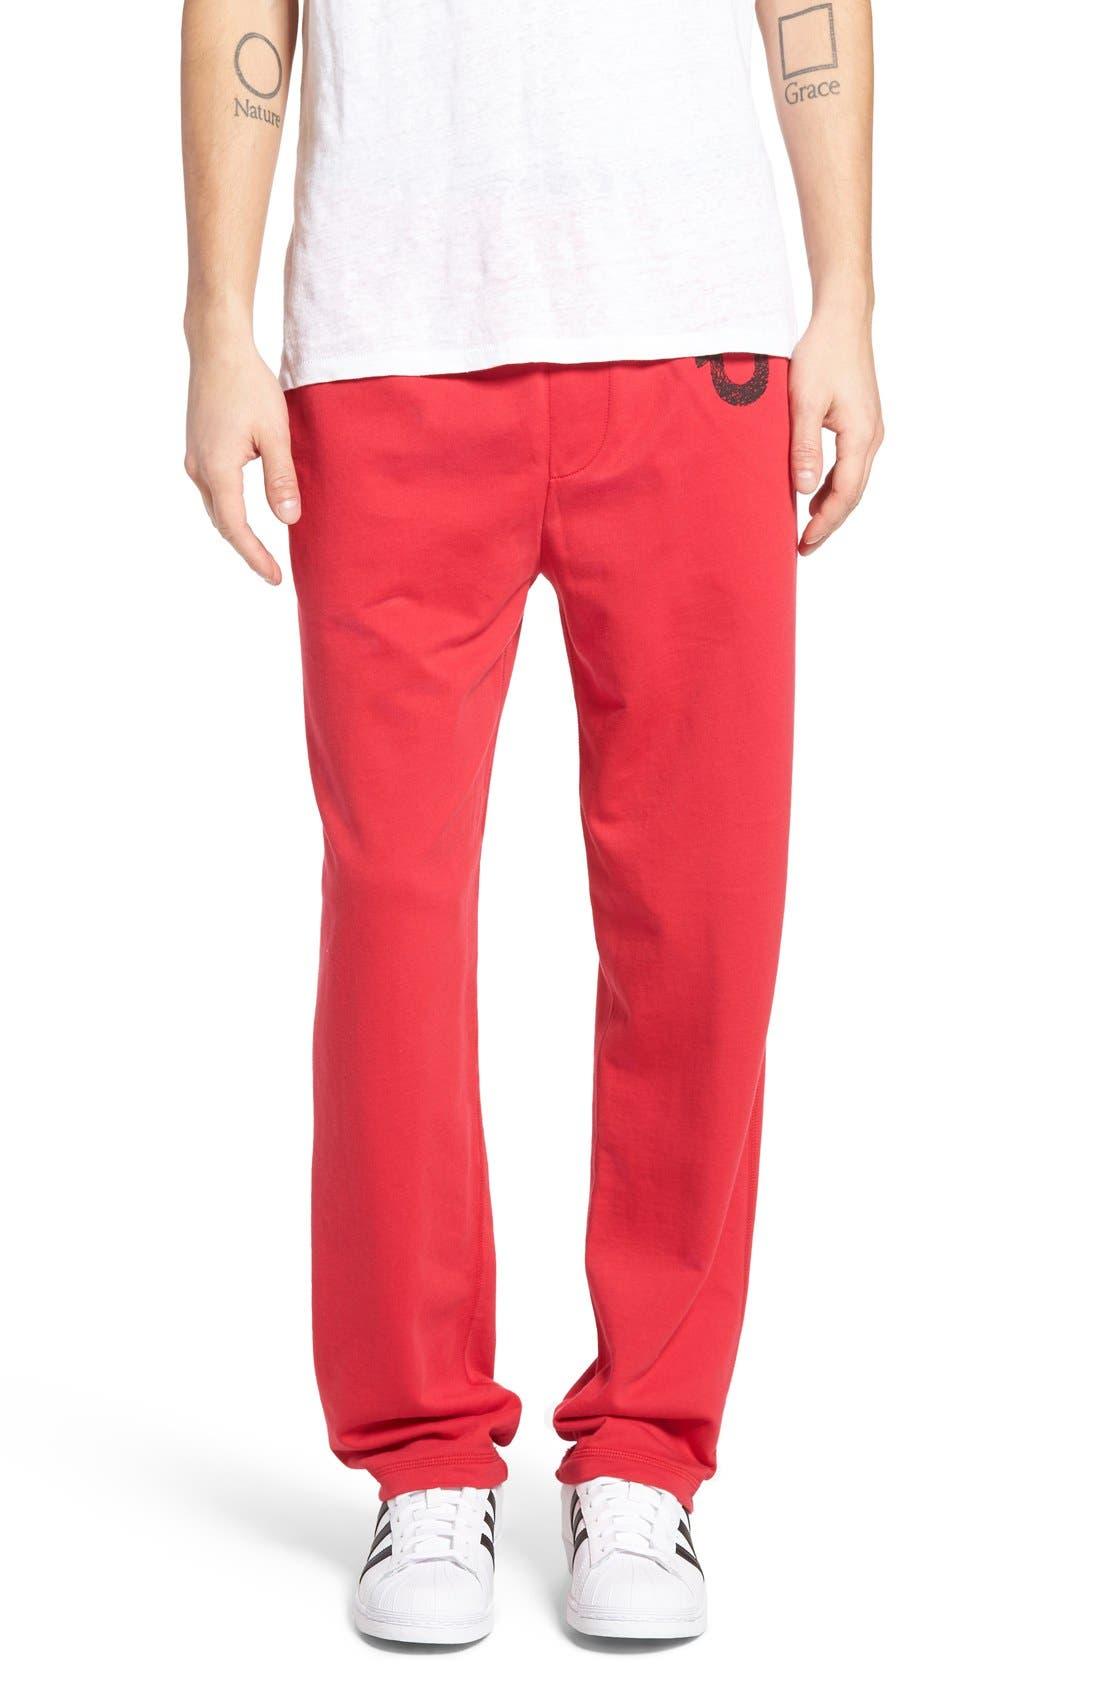 Alternate Image 1 Selected - True Religion Brand Jeans Open Leg Sweatpants